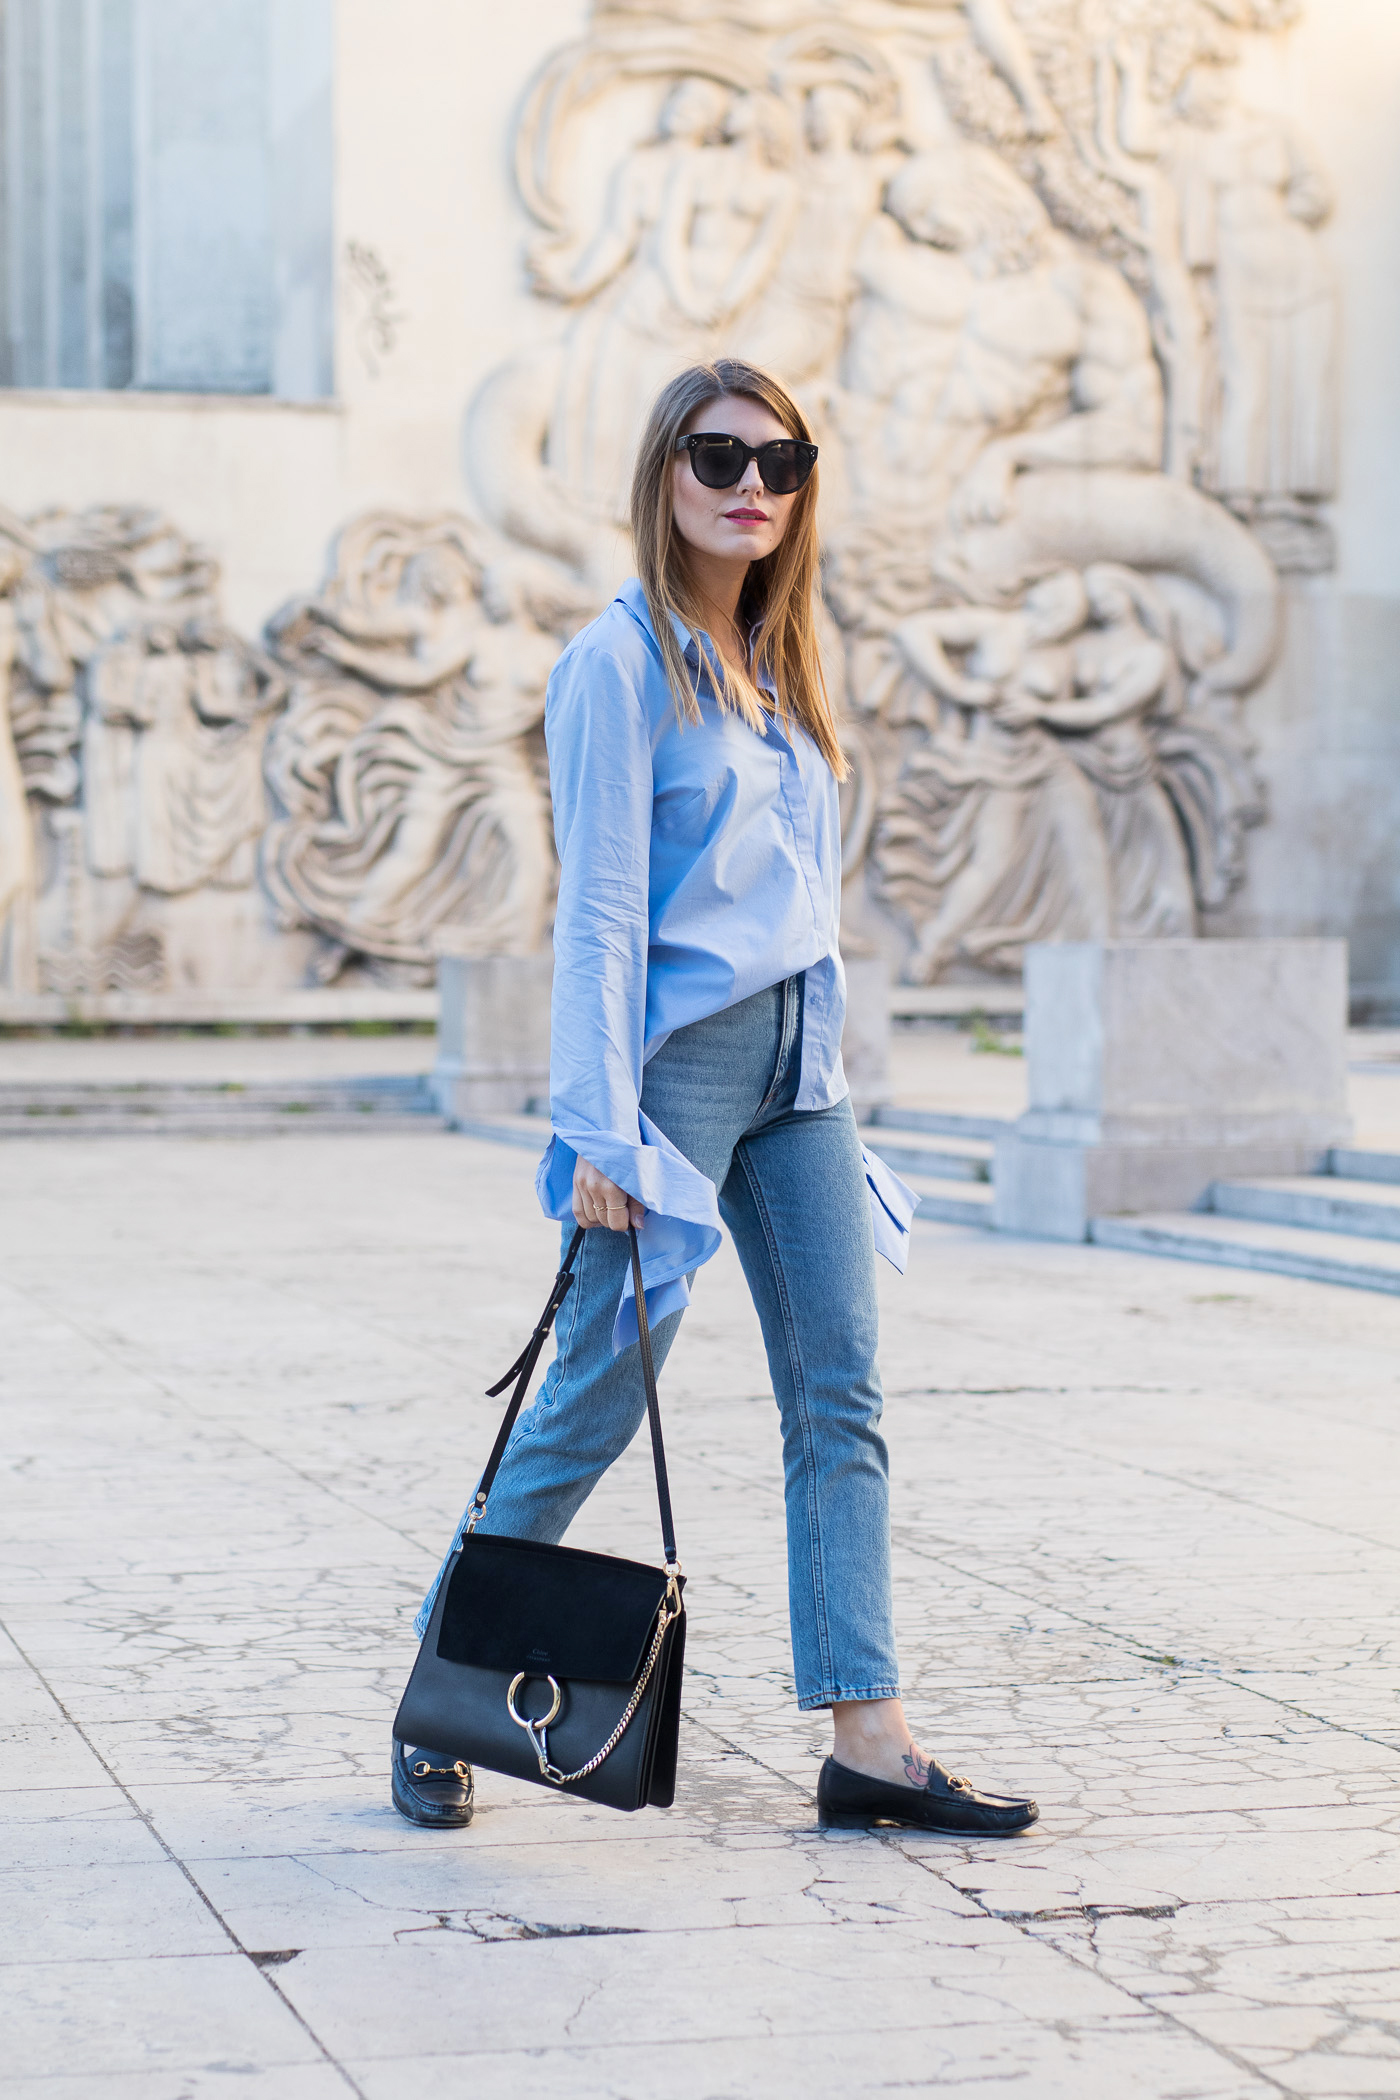 paris_casual_business_look_1